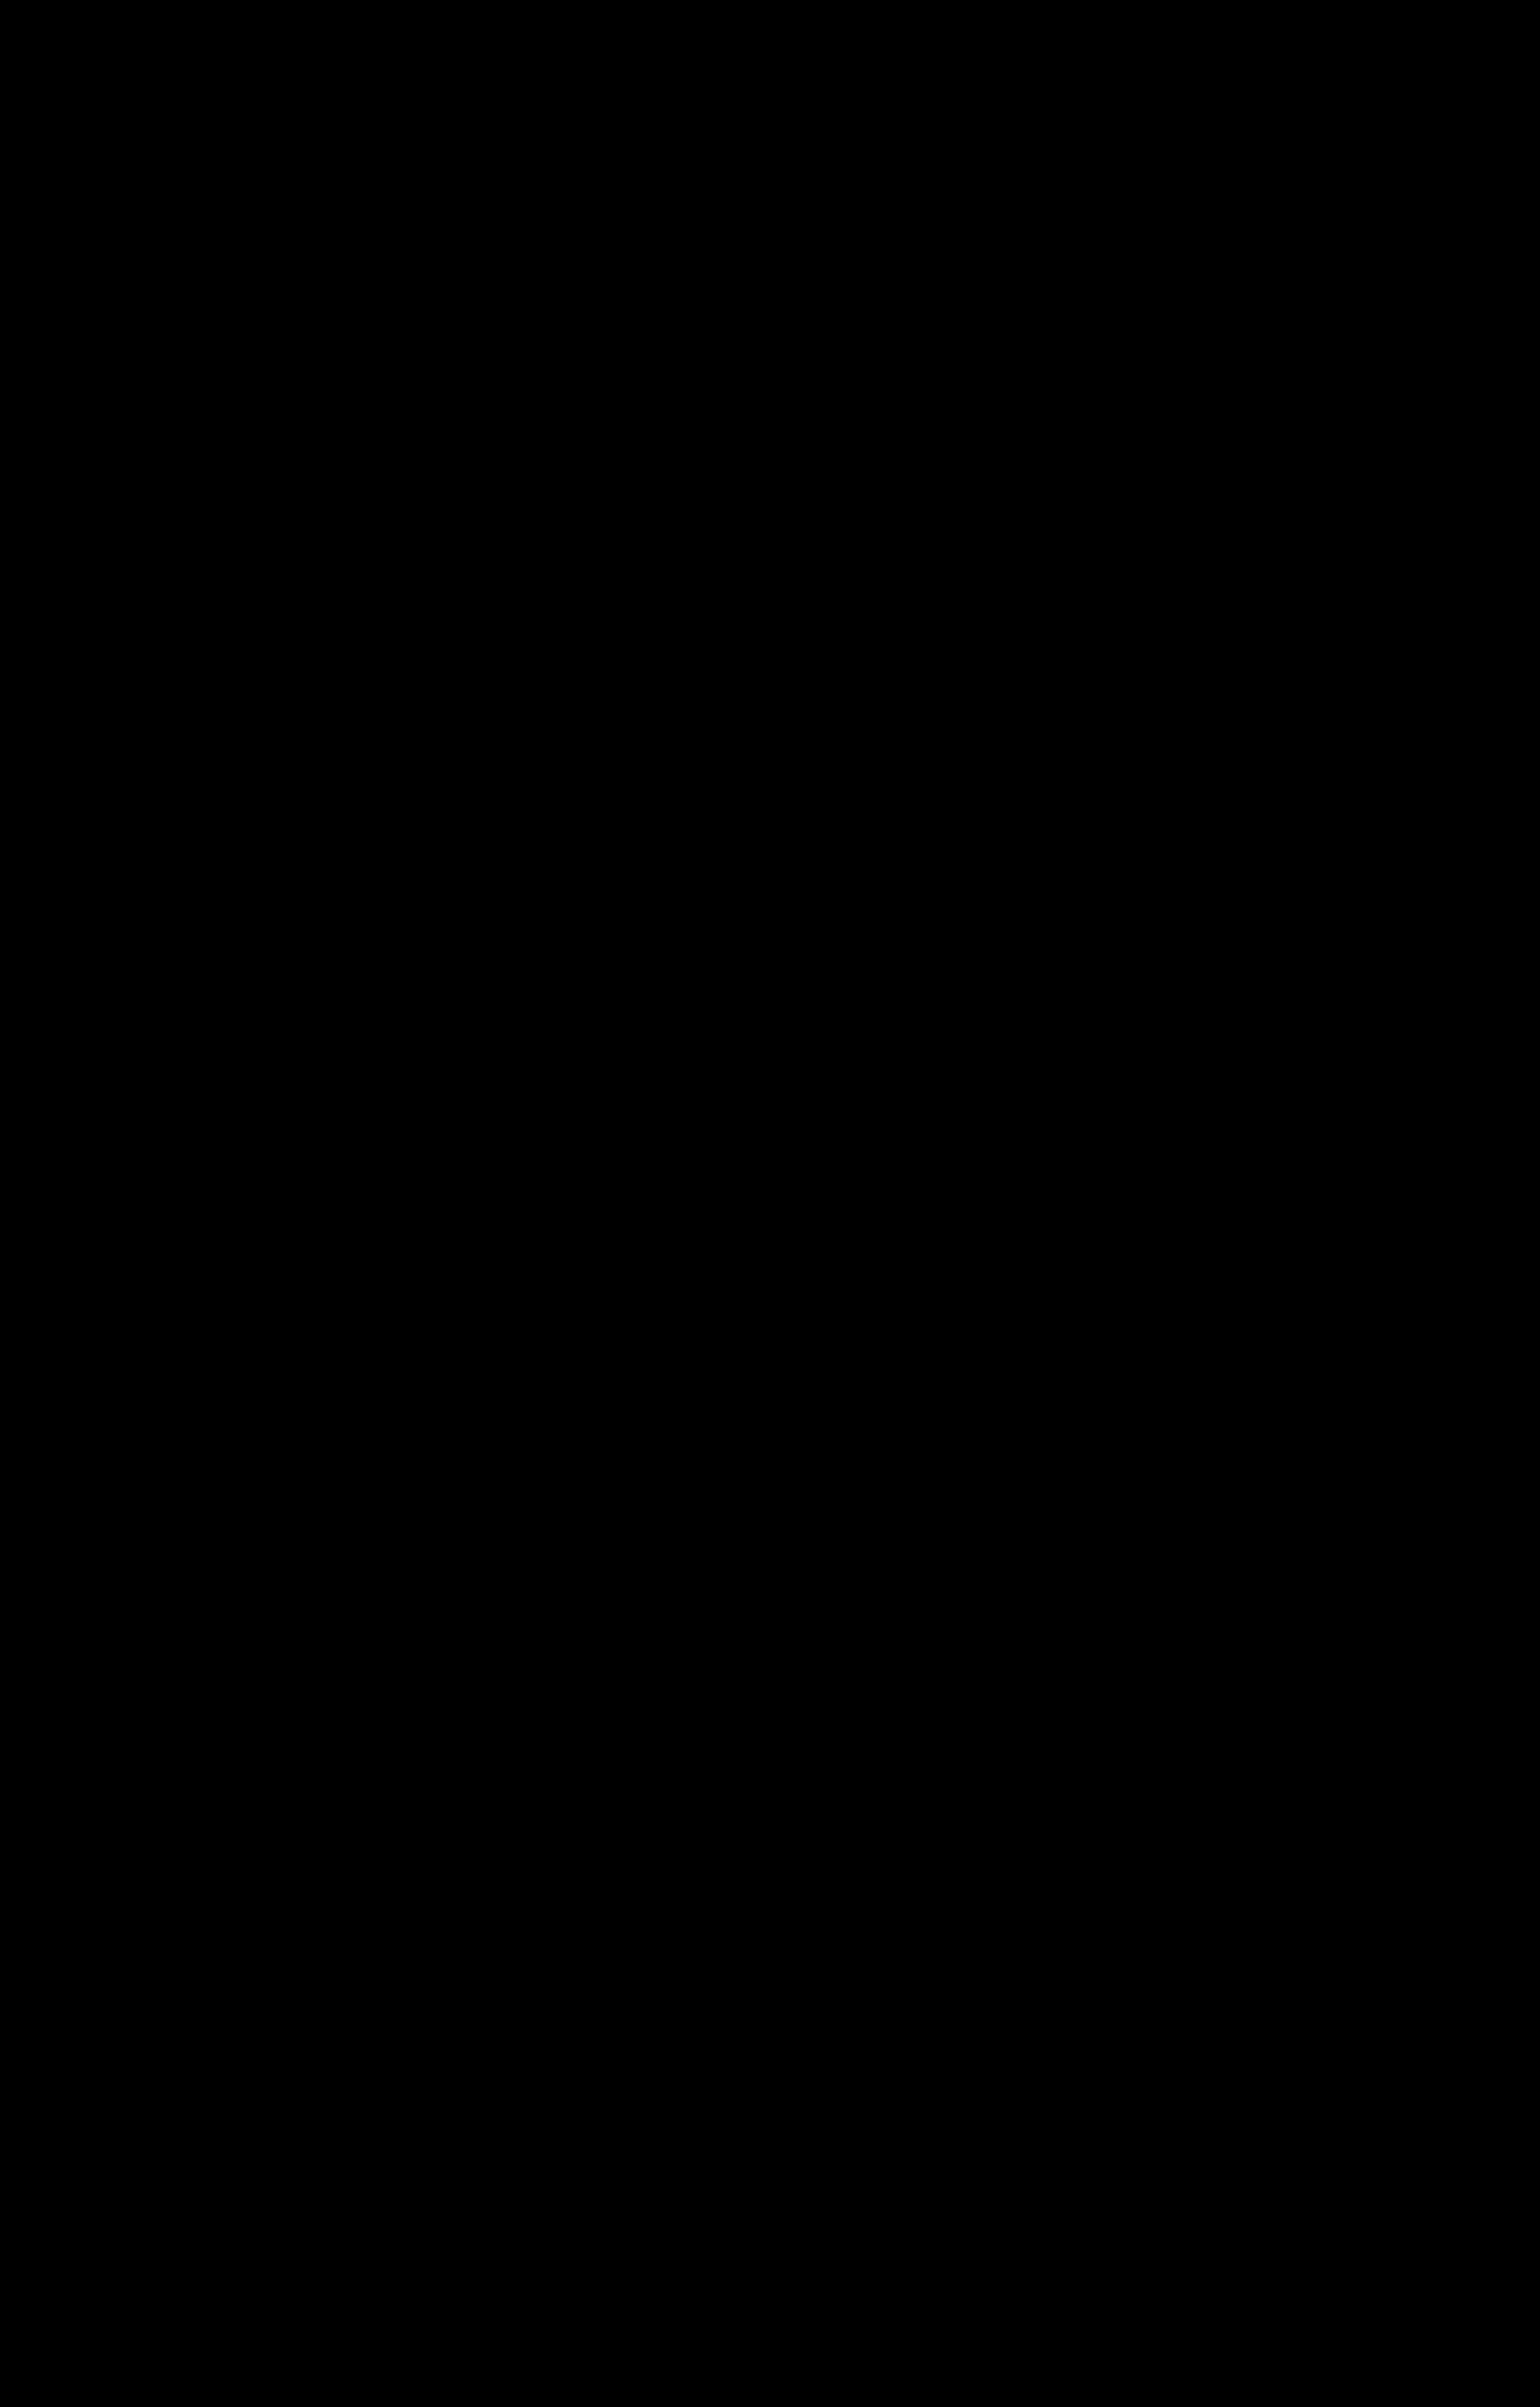 Thumb clipart sideways. File latin capital letter